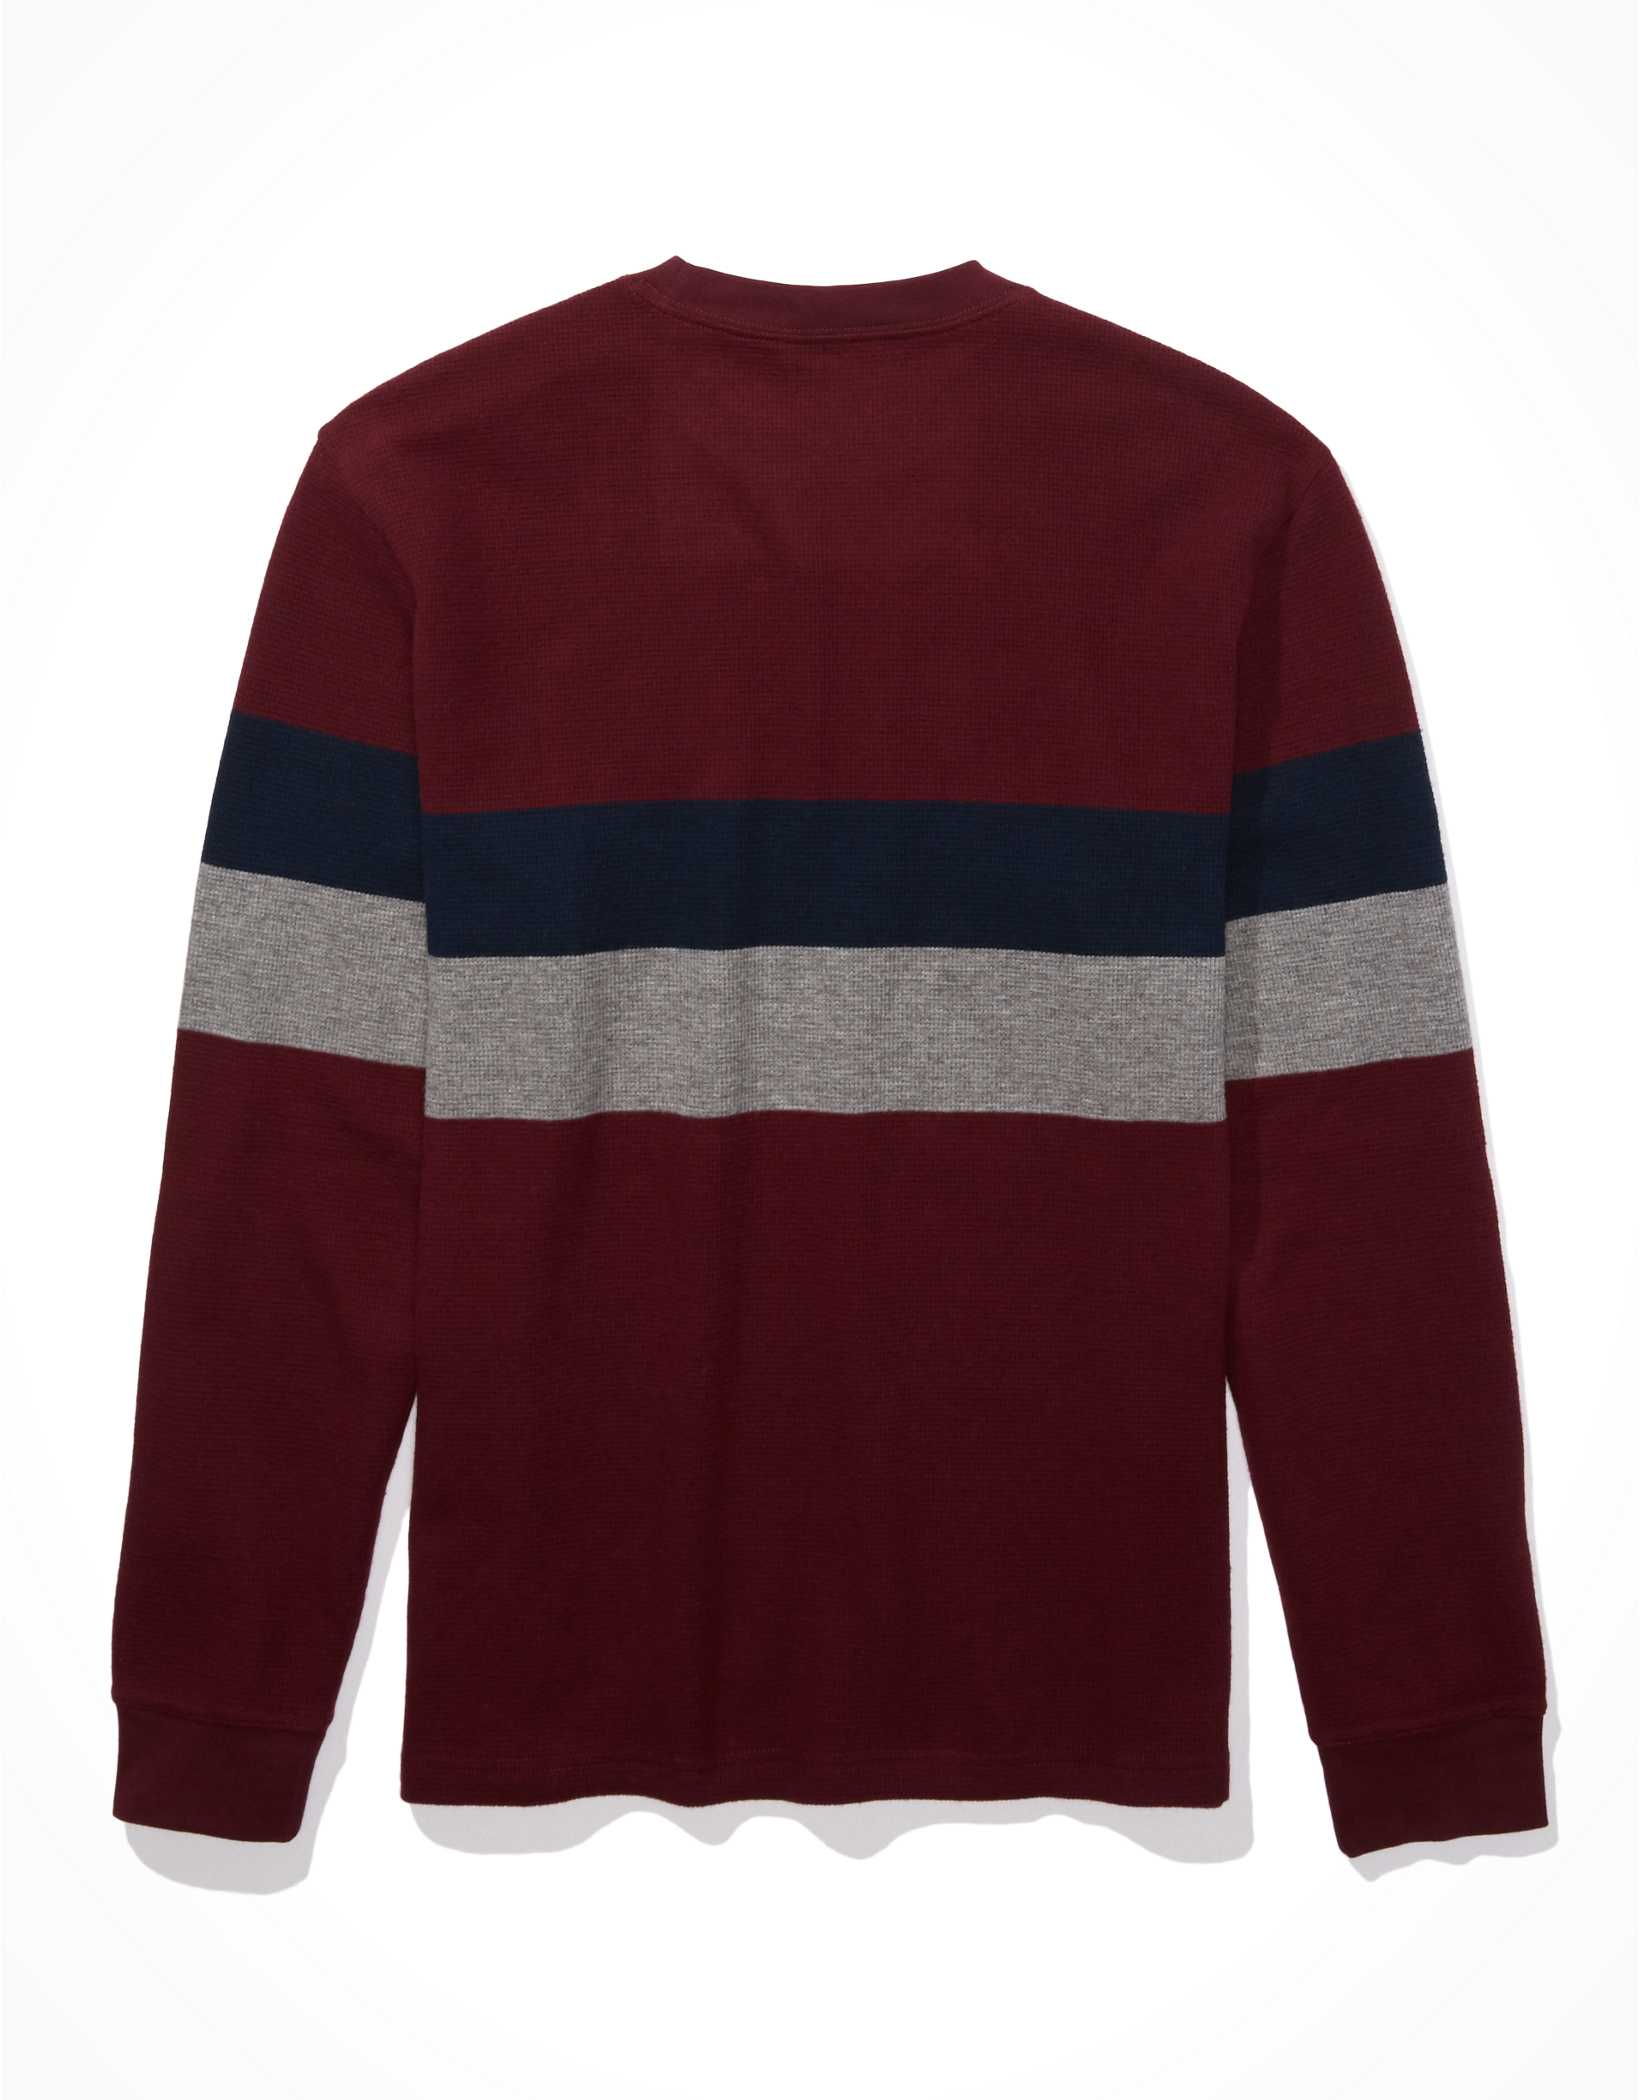 AE Long-Sleeve Thermal Shirt